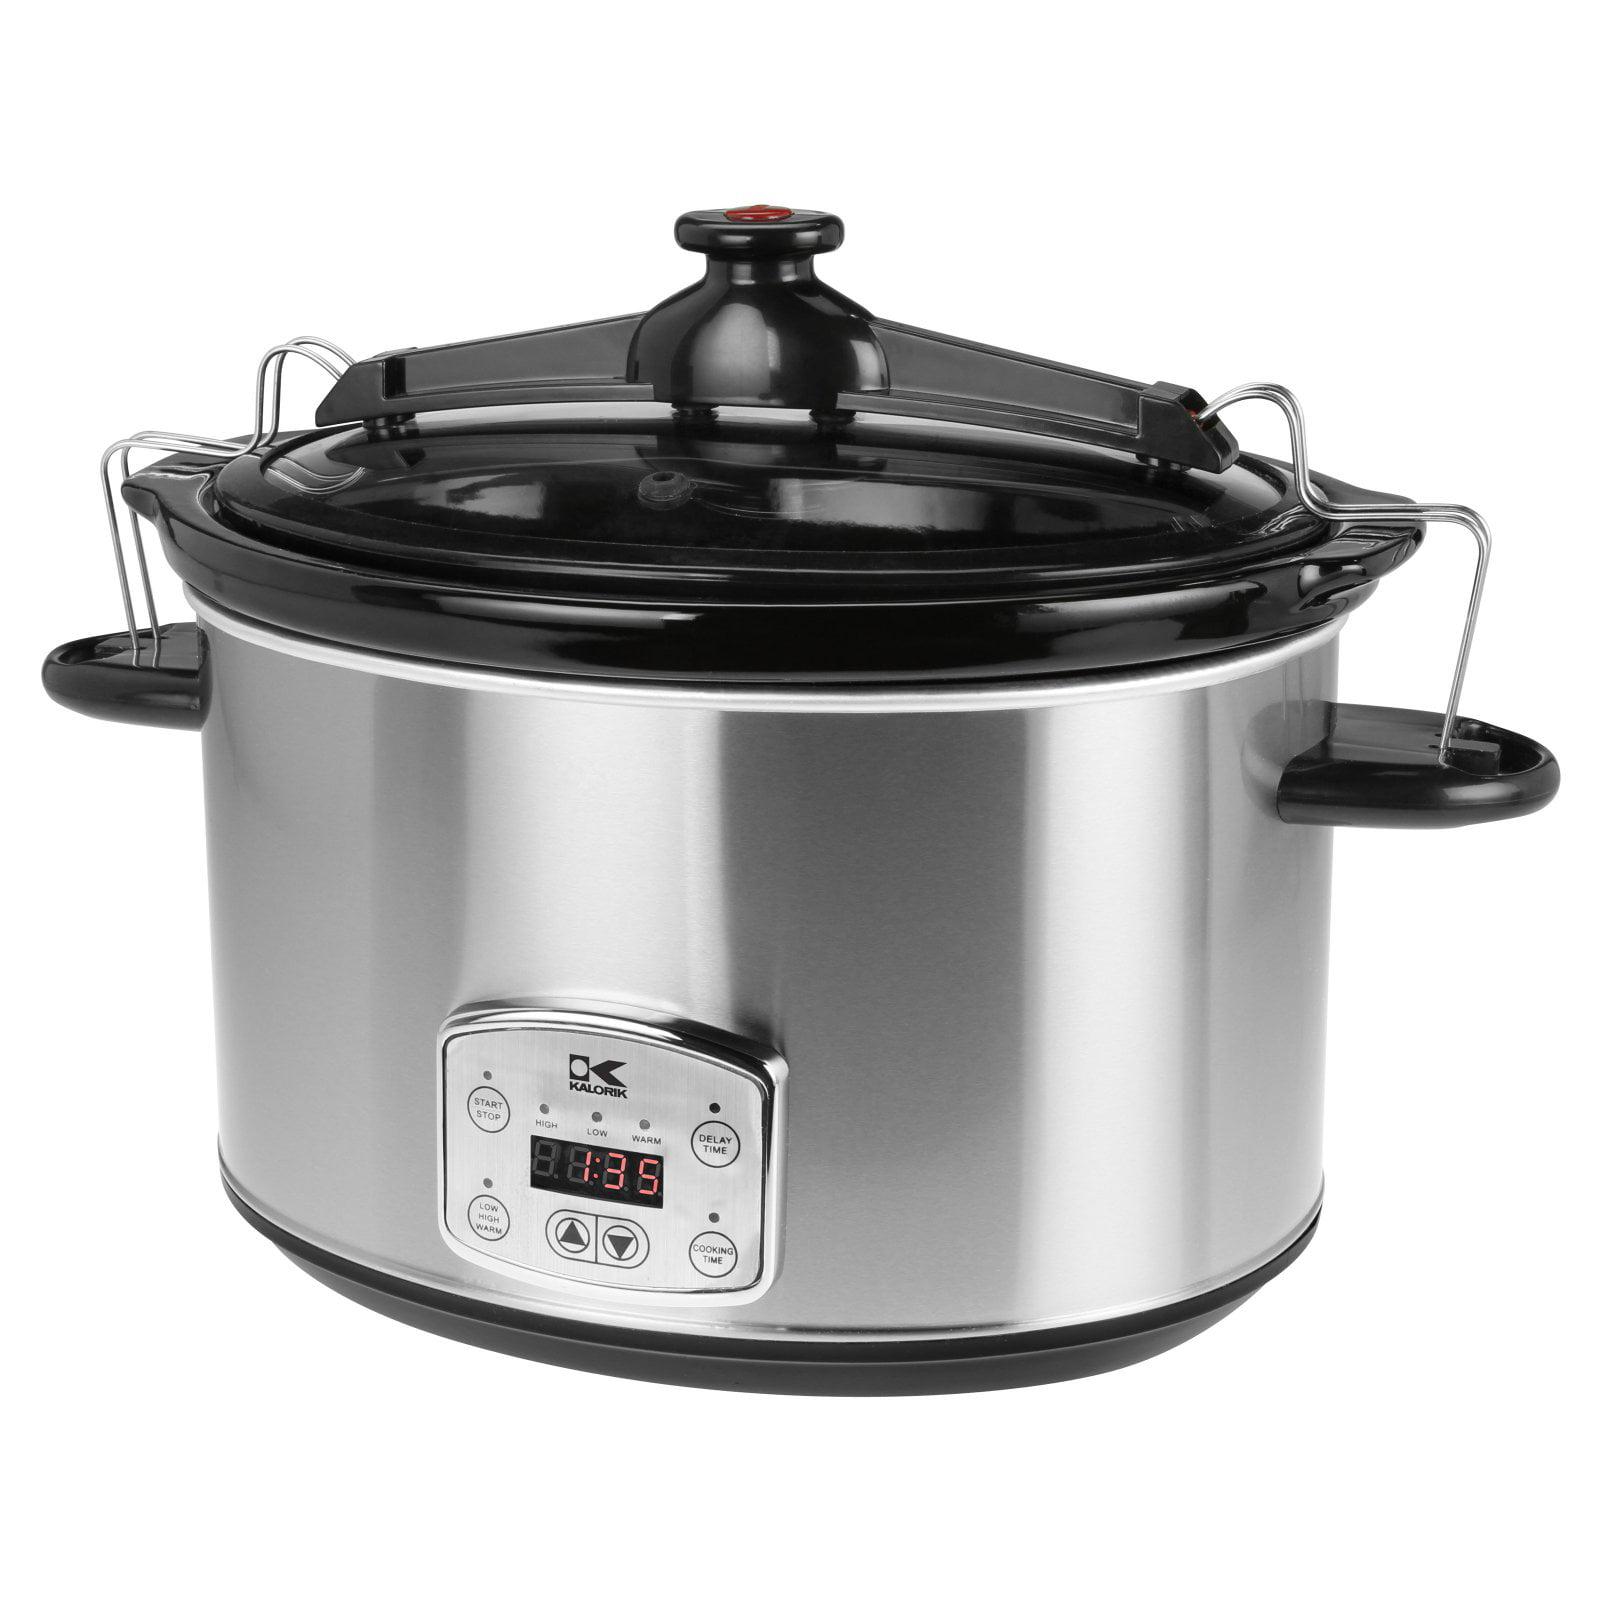 Kalorik 8-Qt Digital Slow Cooker with Locking Lid, Stainless Steel